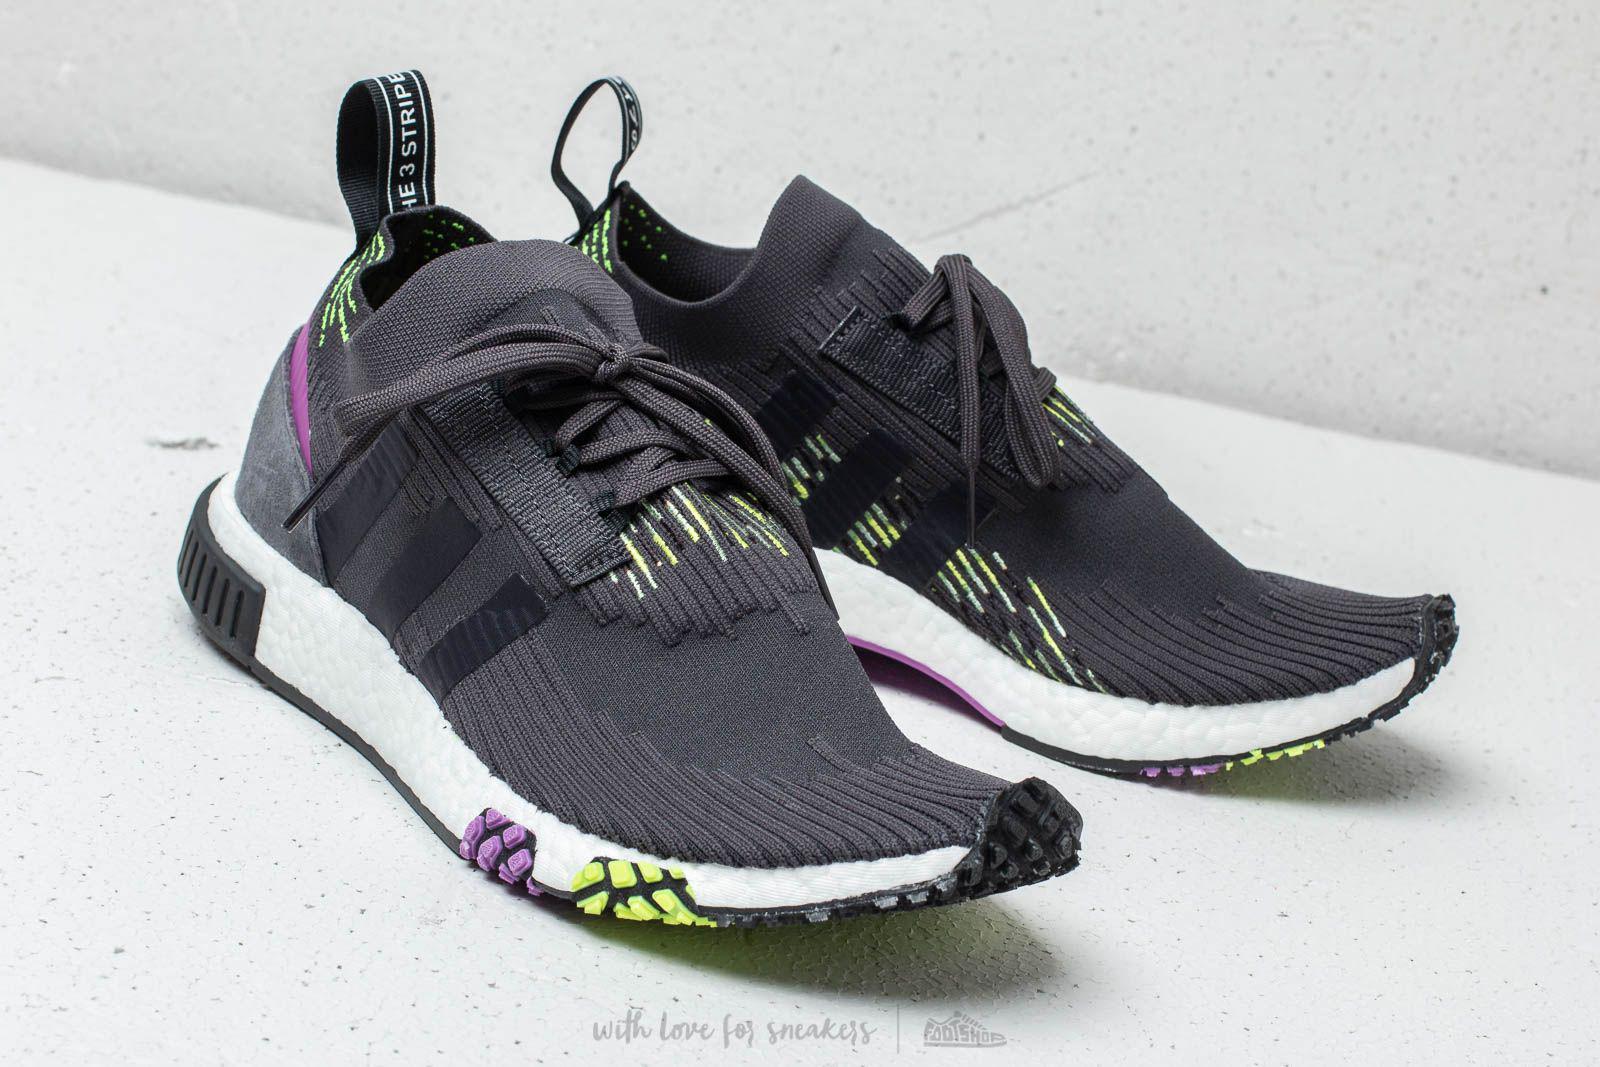 915f05a58 Lyst - adidas Originals Adidas Nmd Racer Primeknit Carbon  Core ...